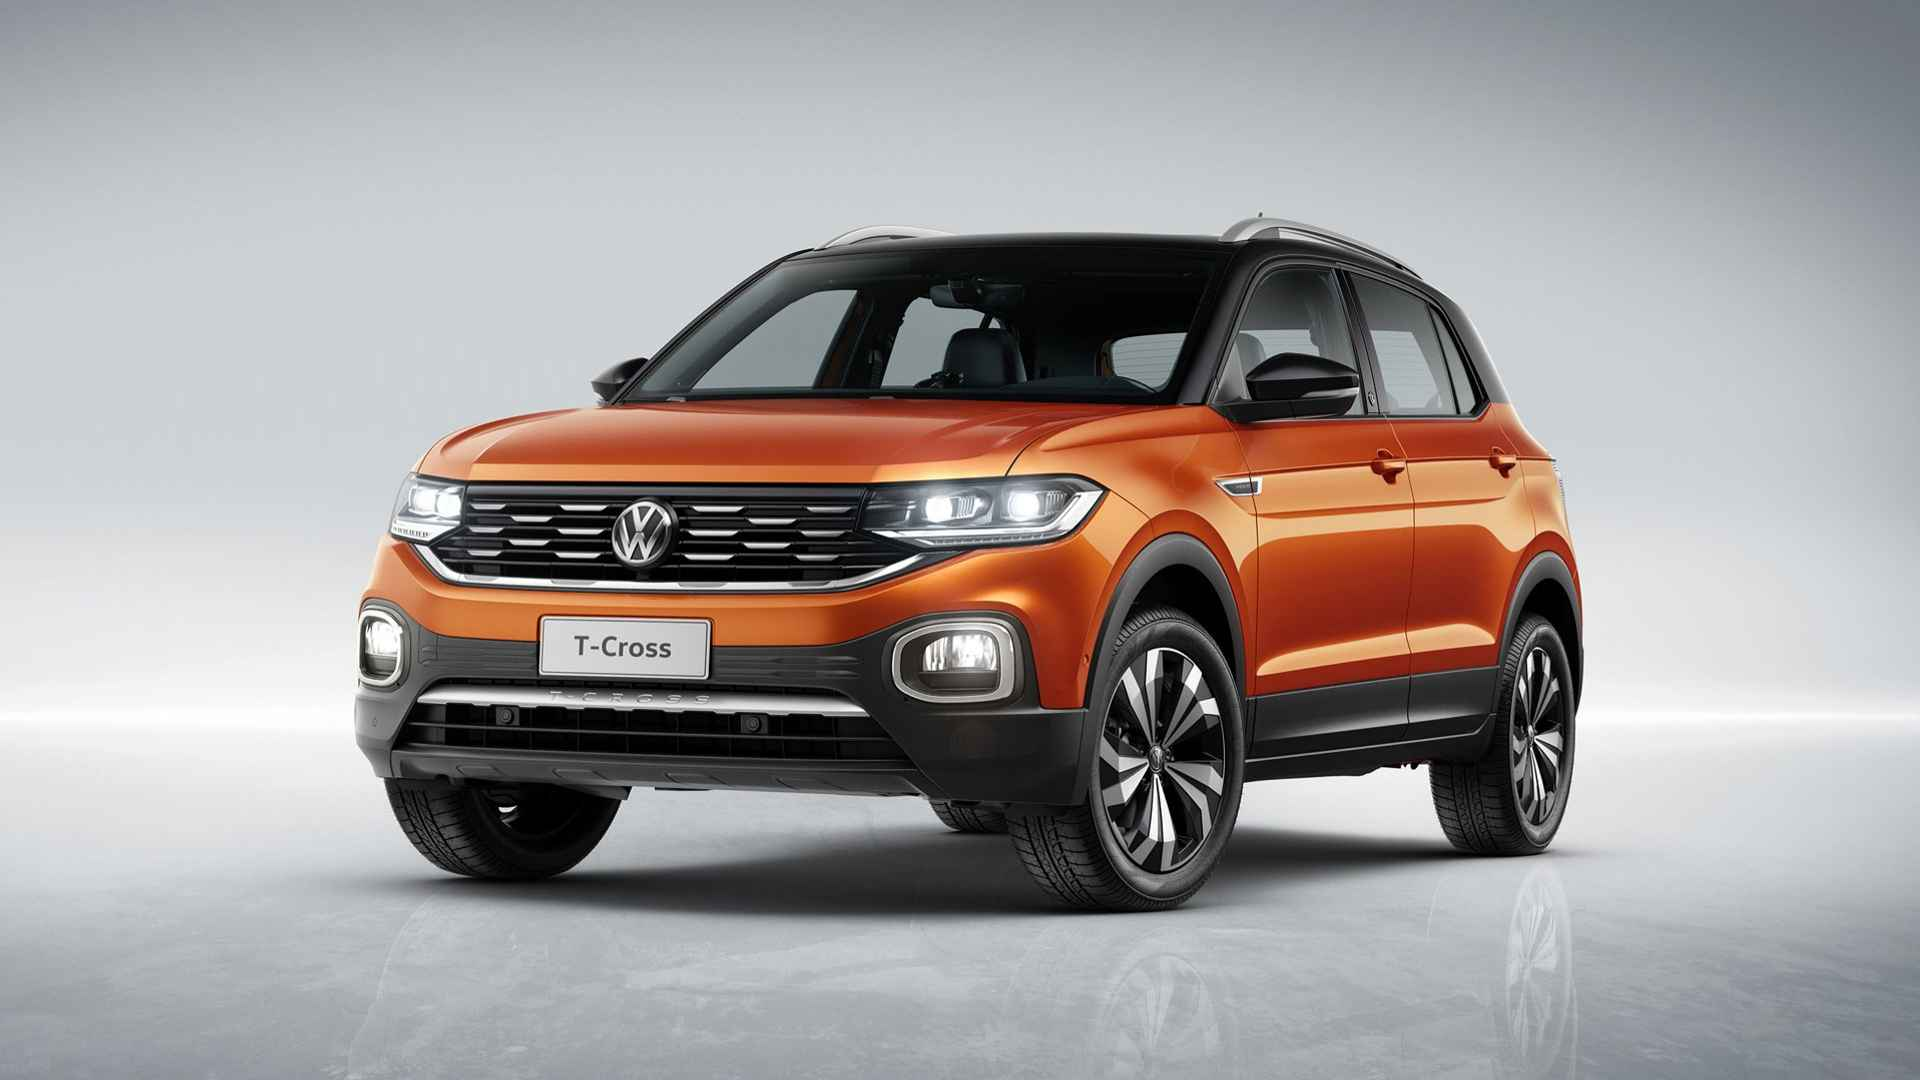 Forum gratis : Compra e venda engenharia Carro Volkswagen-t-cross-brasil